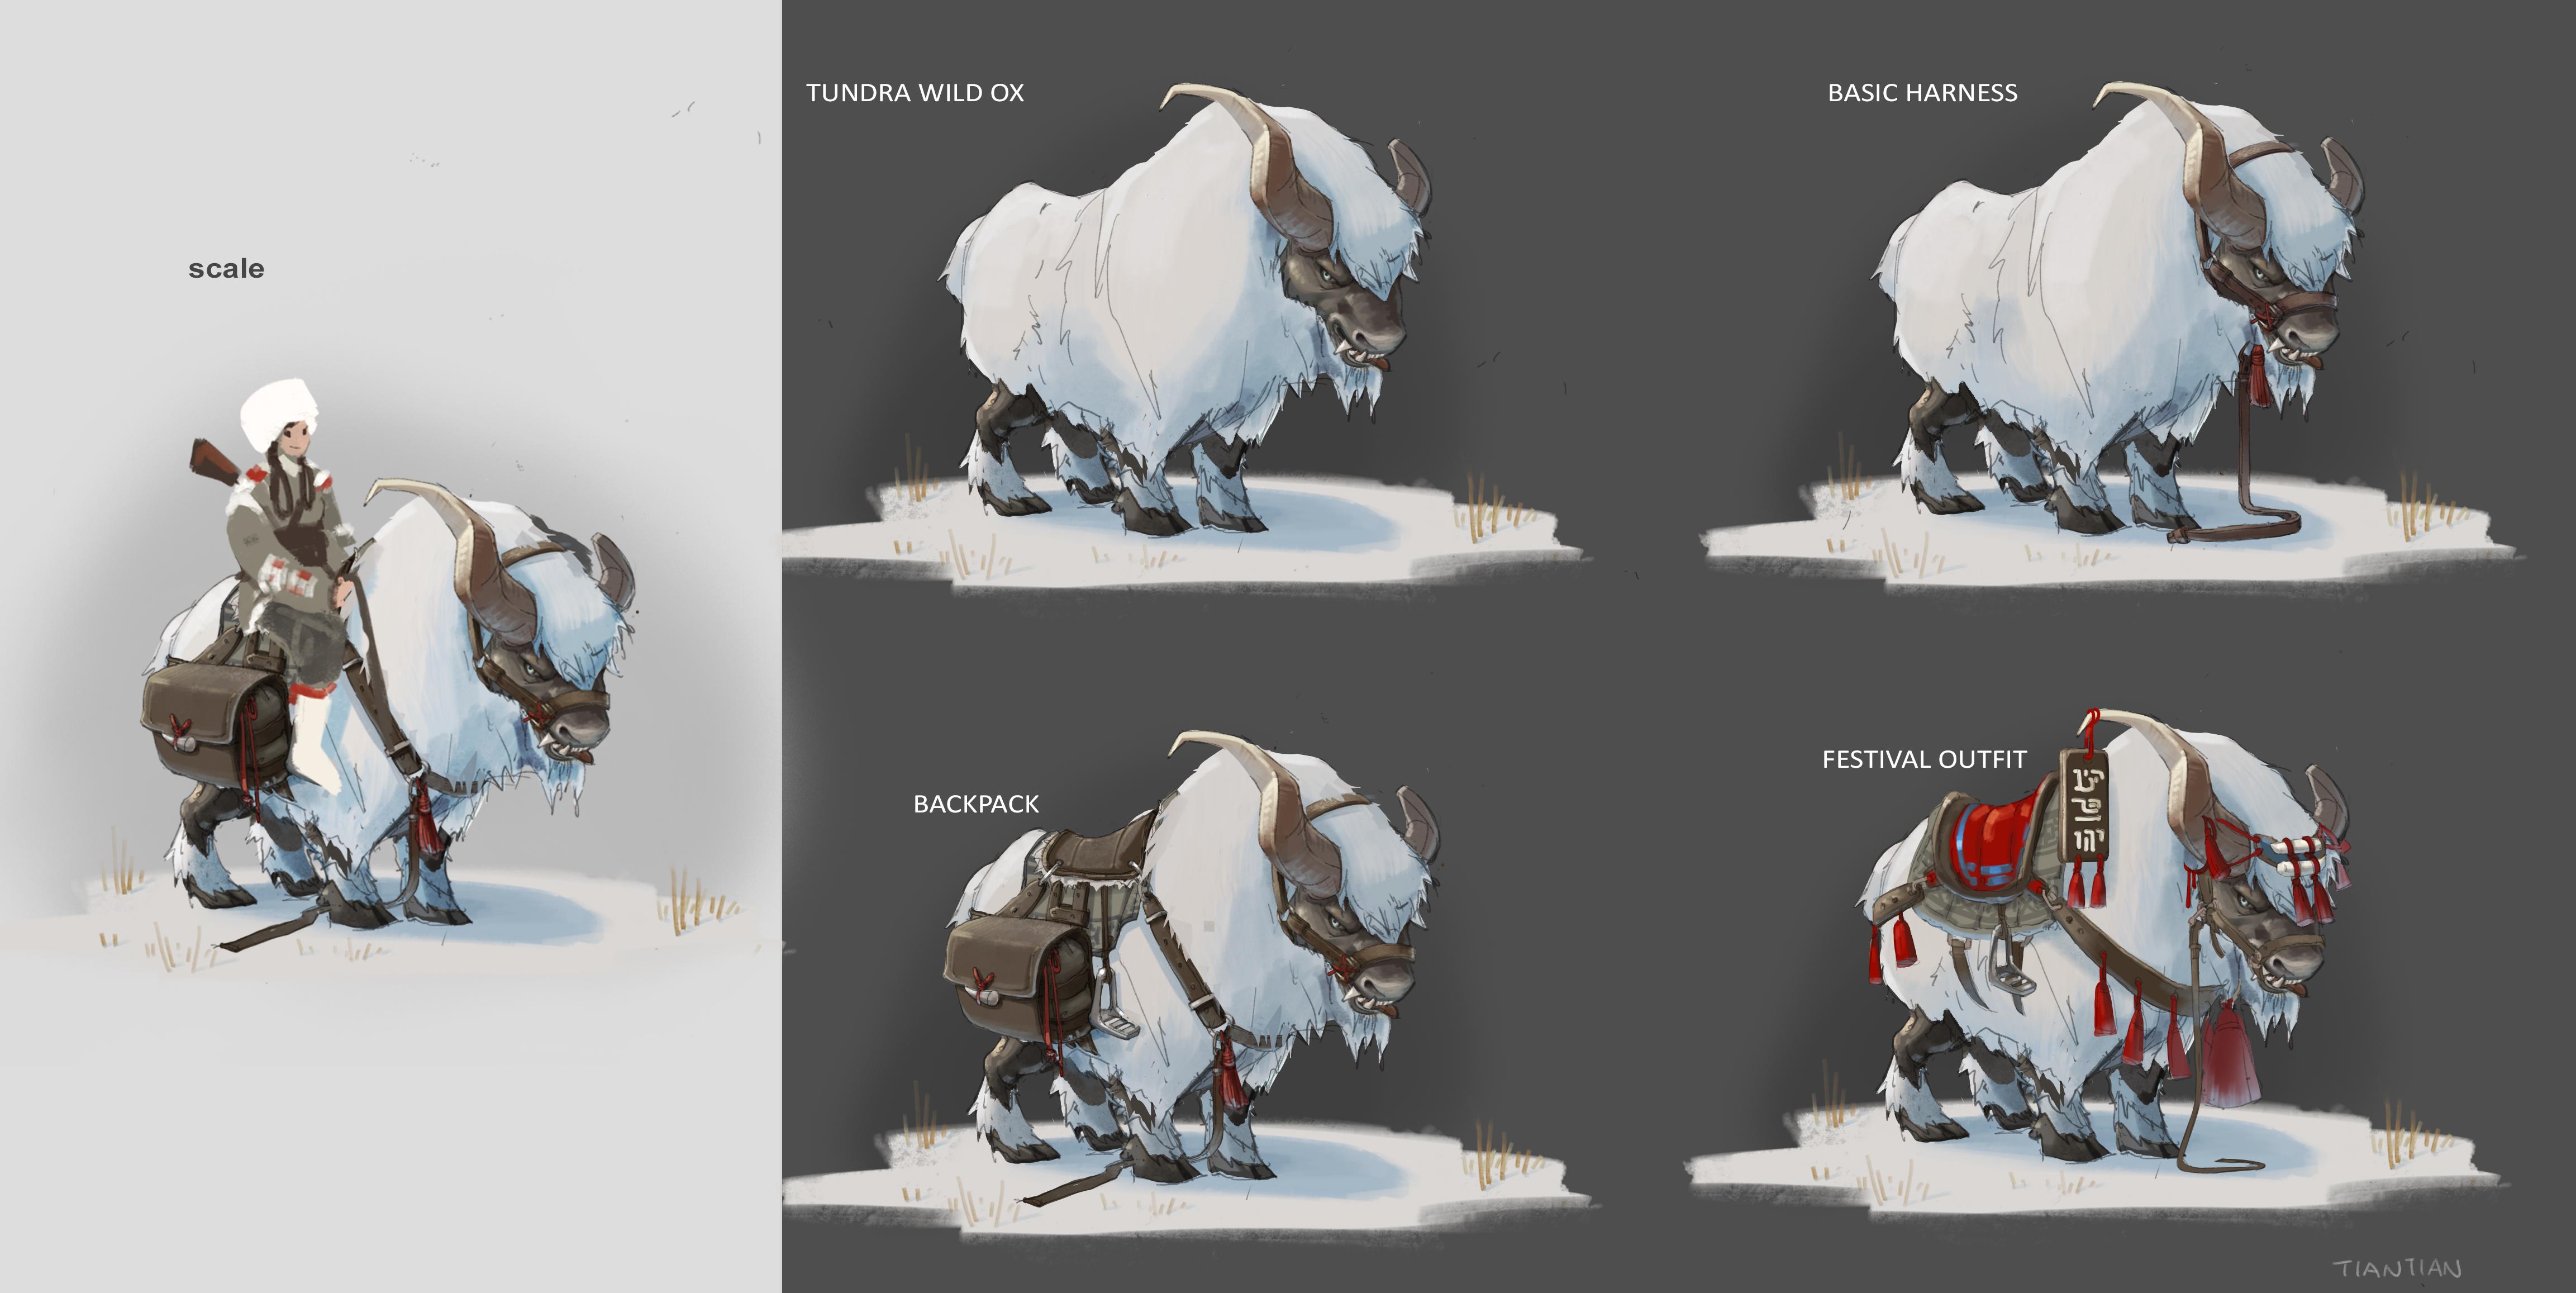 tundra wild ox